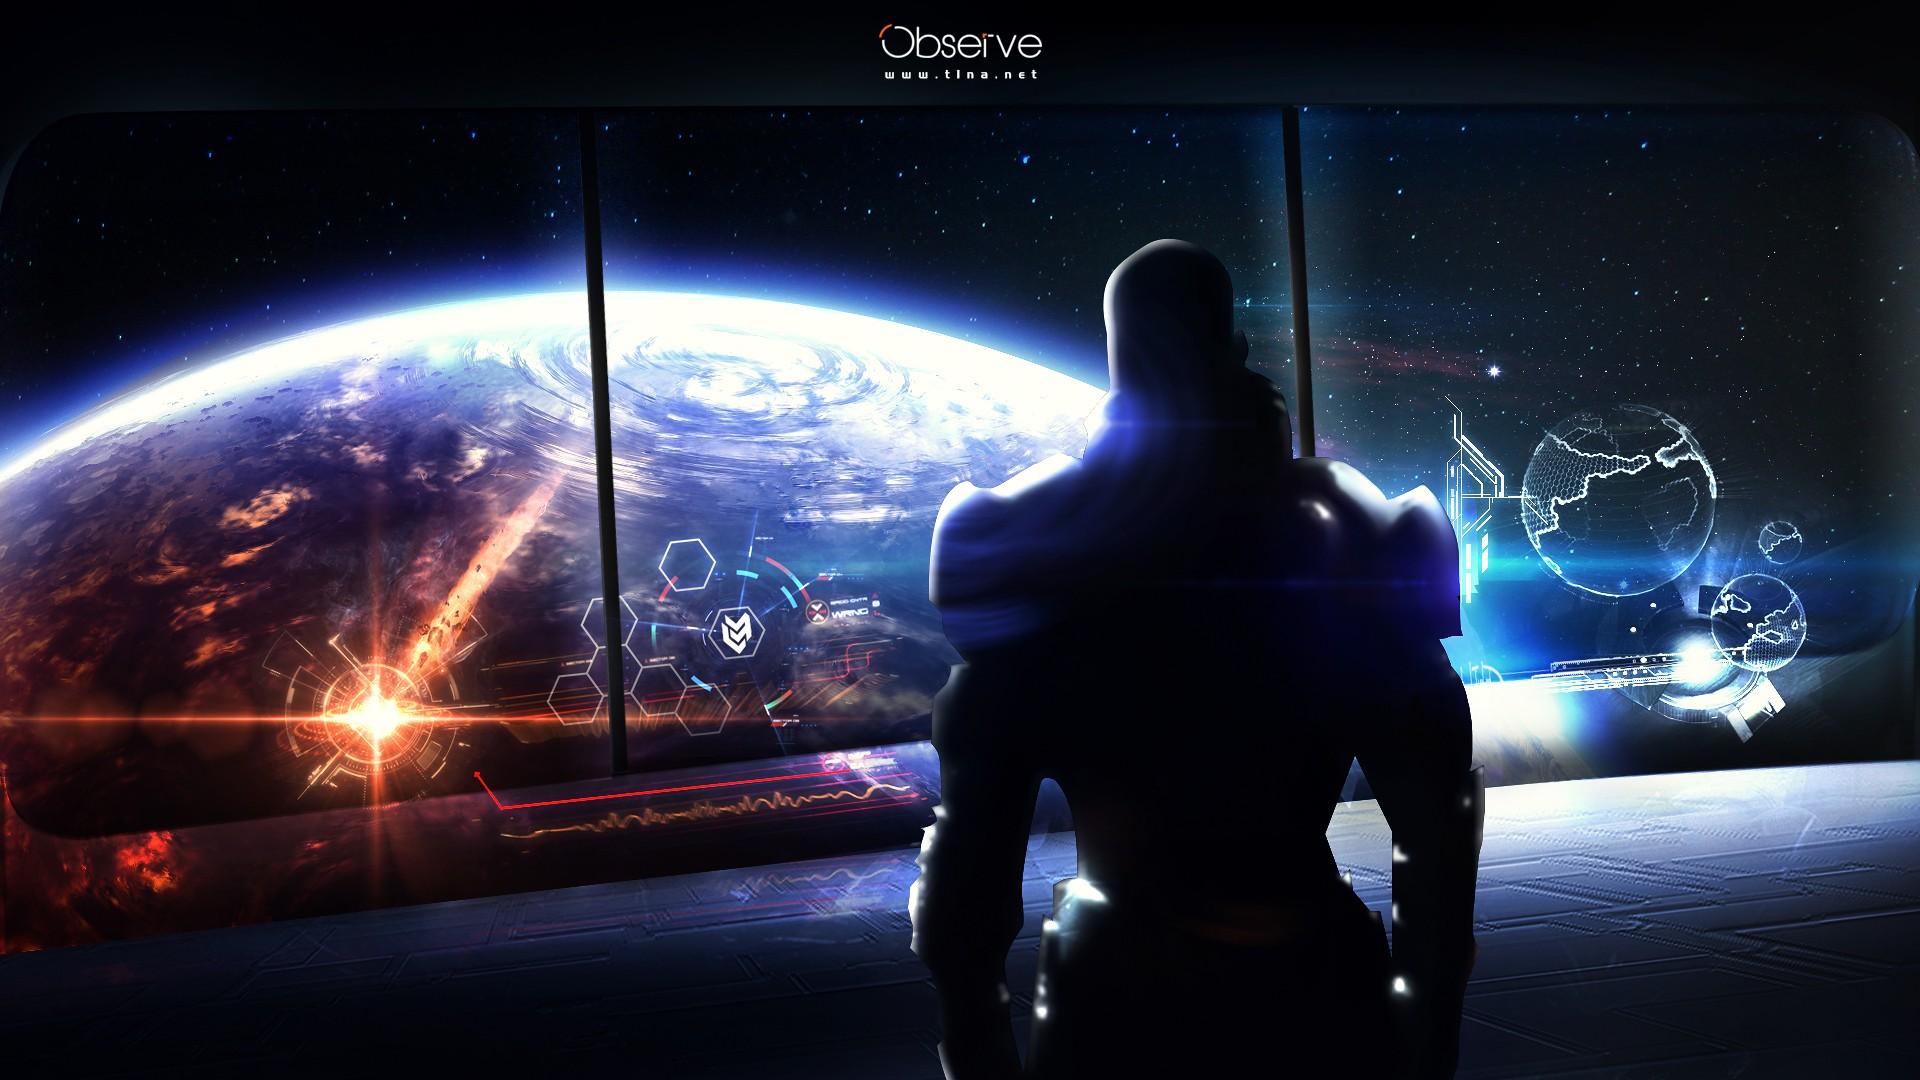 48+ Mass Effect wallpapers ·① Download free beautiful ...